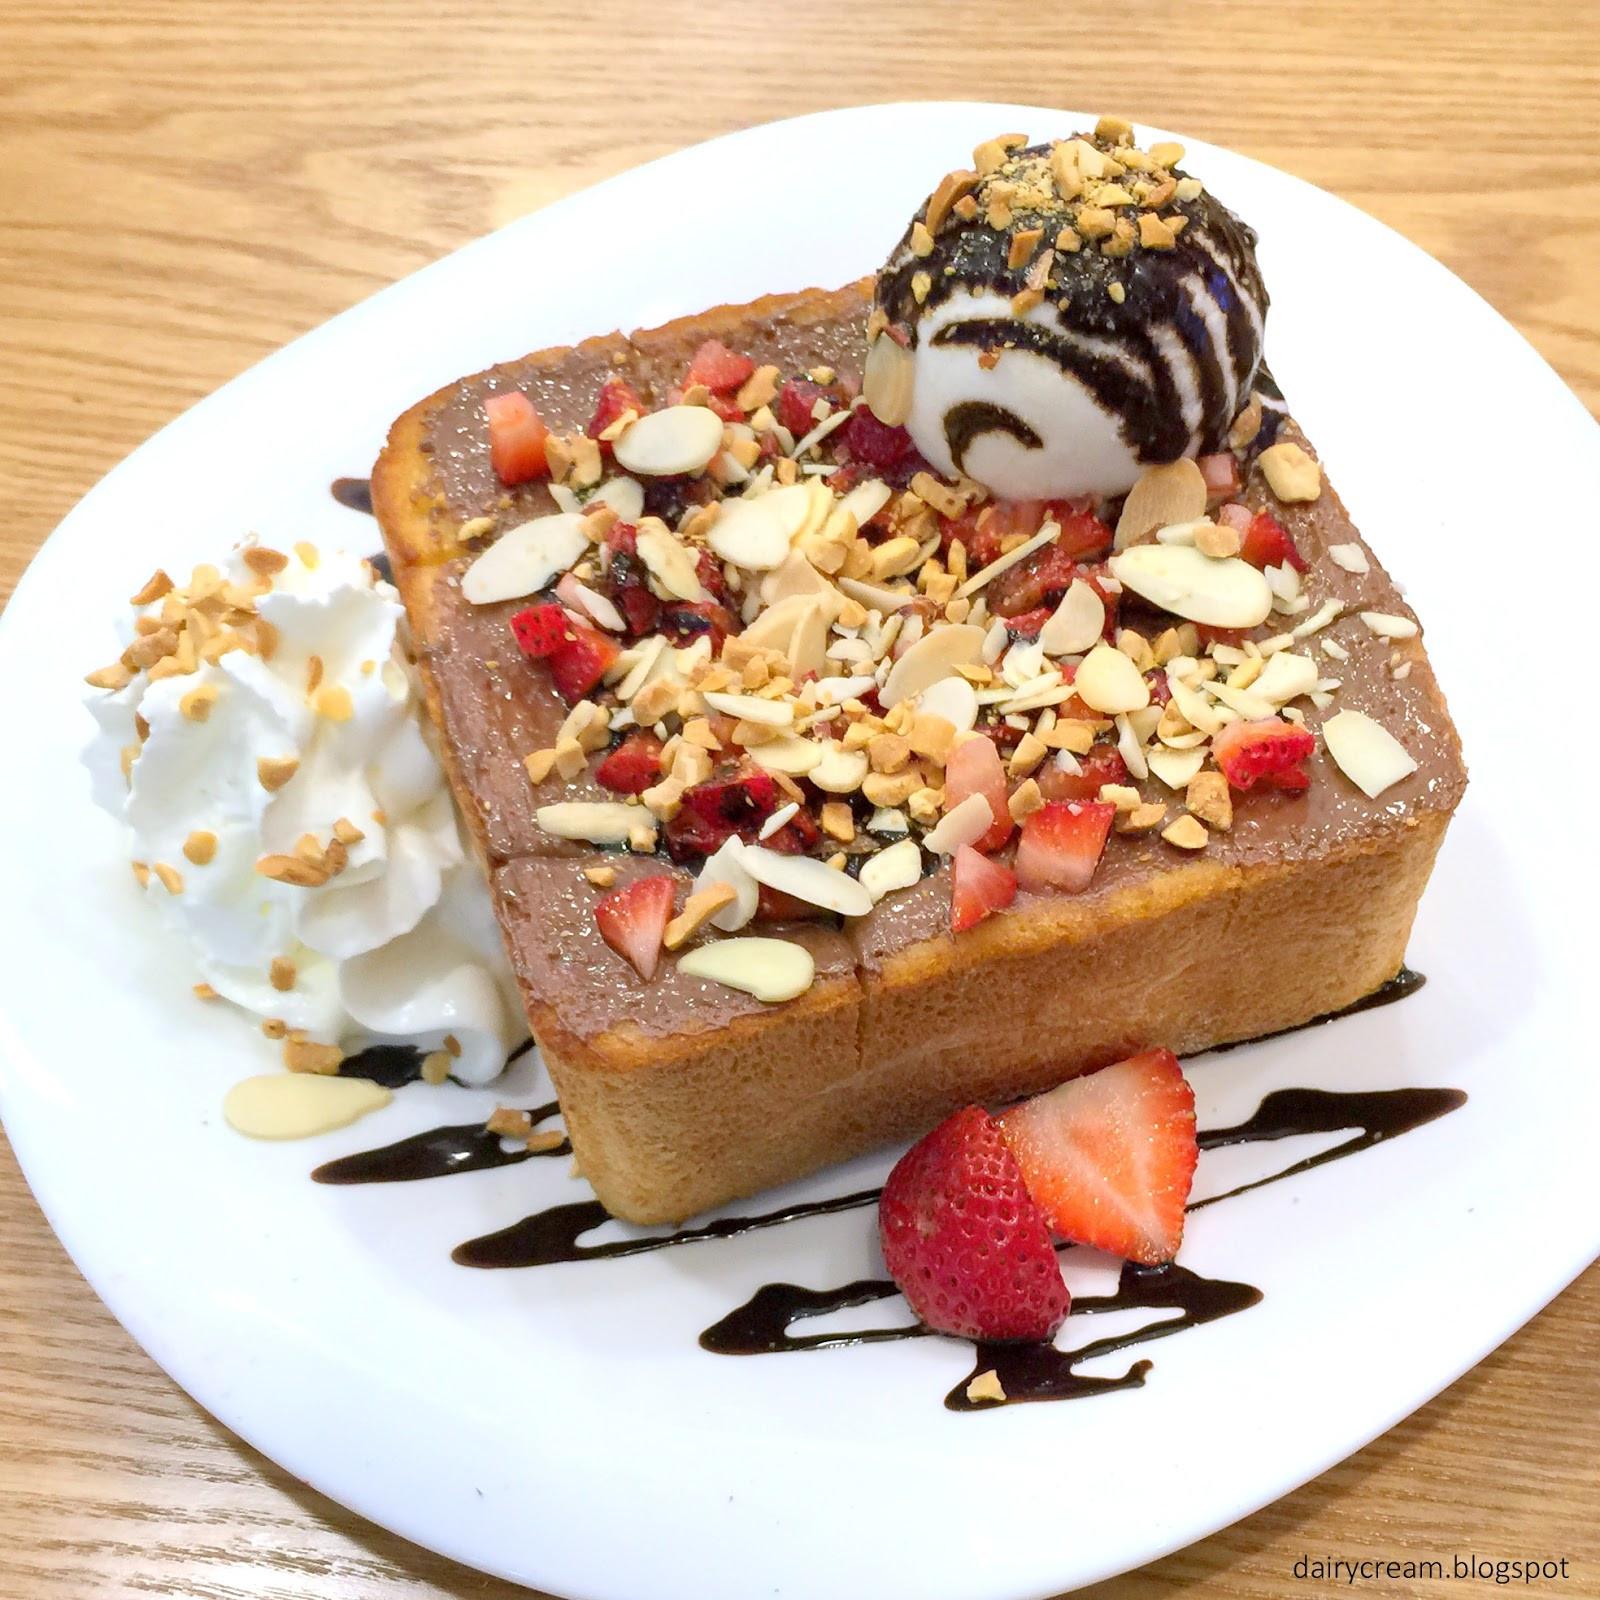 Spoon Dessert Cafe  Singapore Japan Food Blog Dairy and Cream O ma Spoon